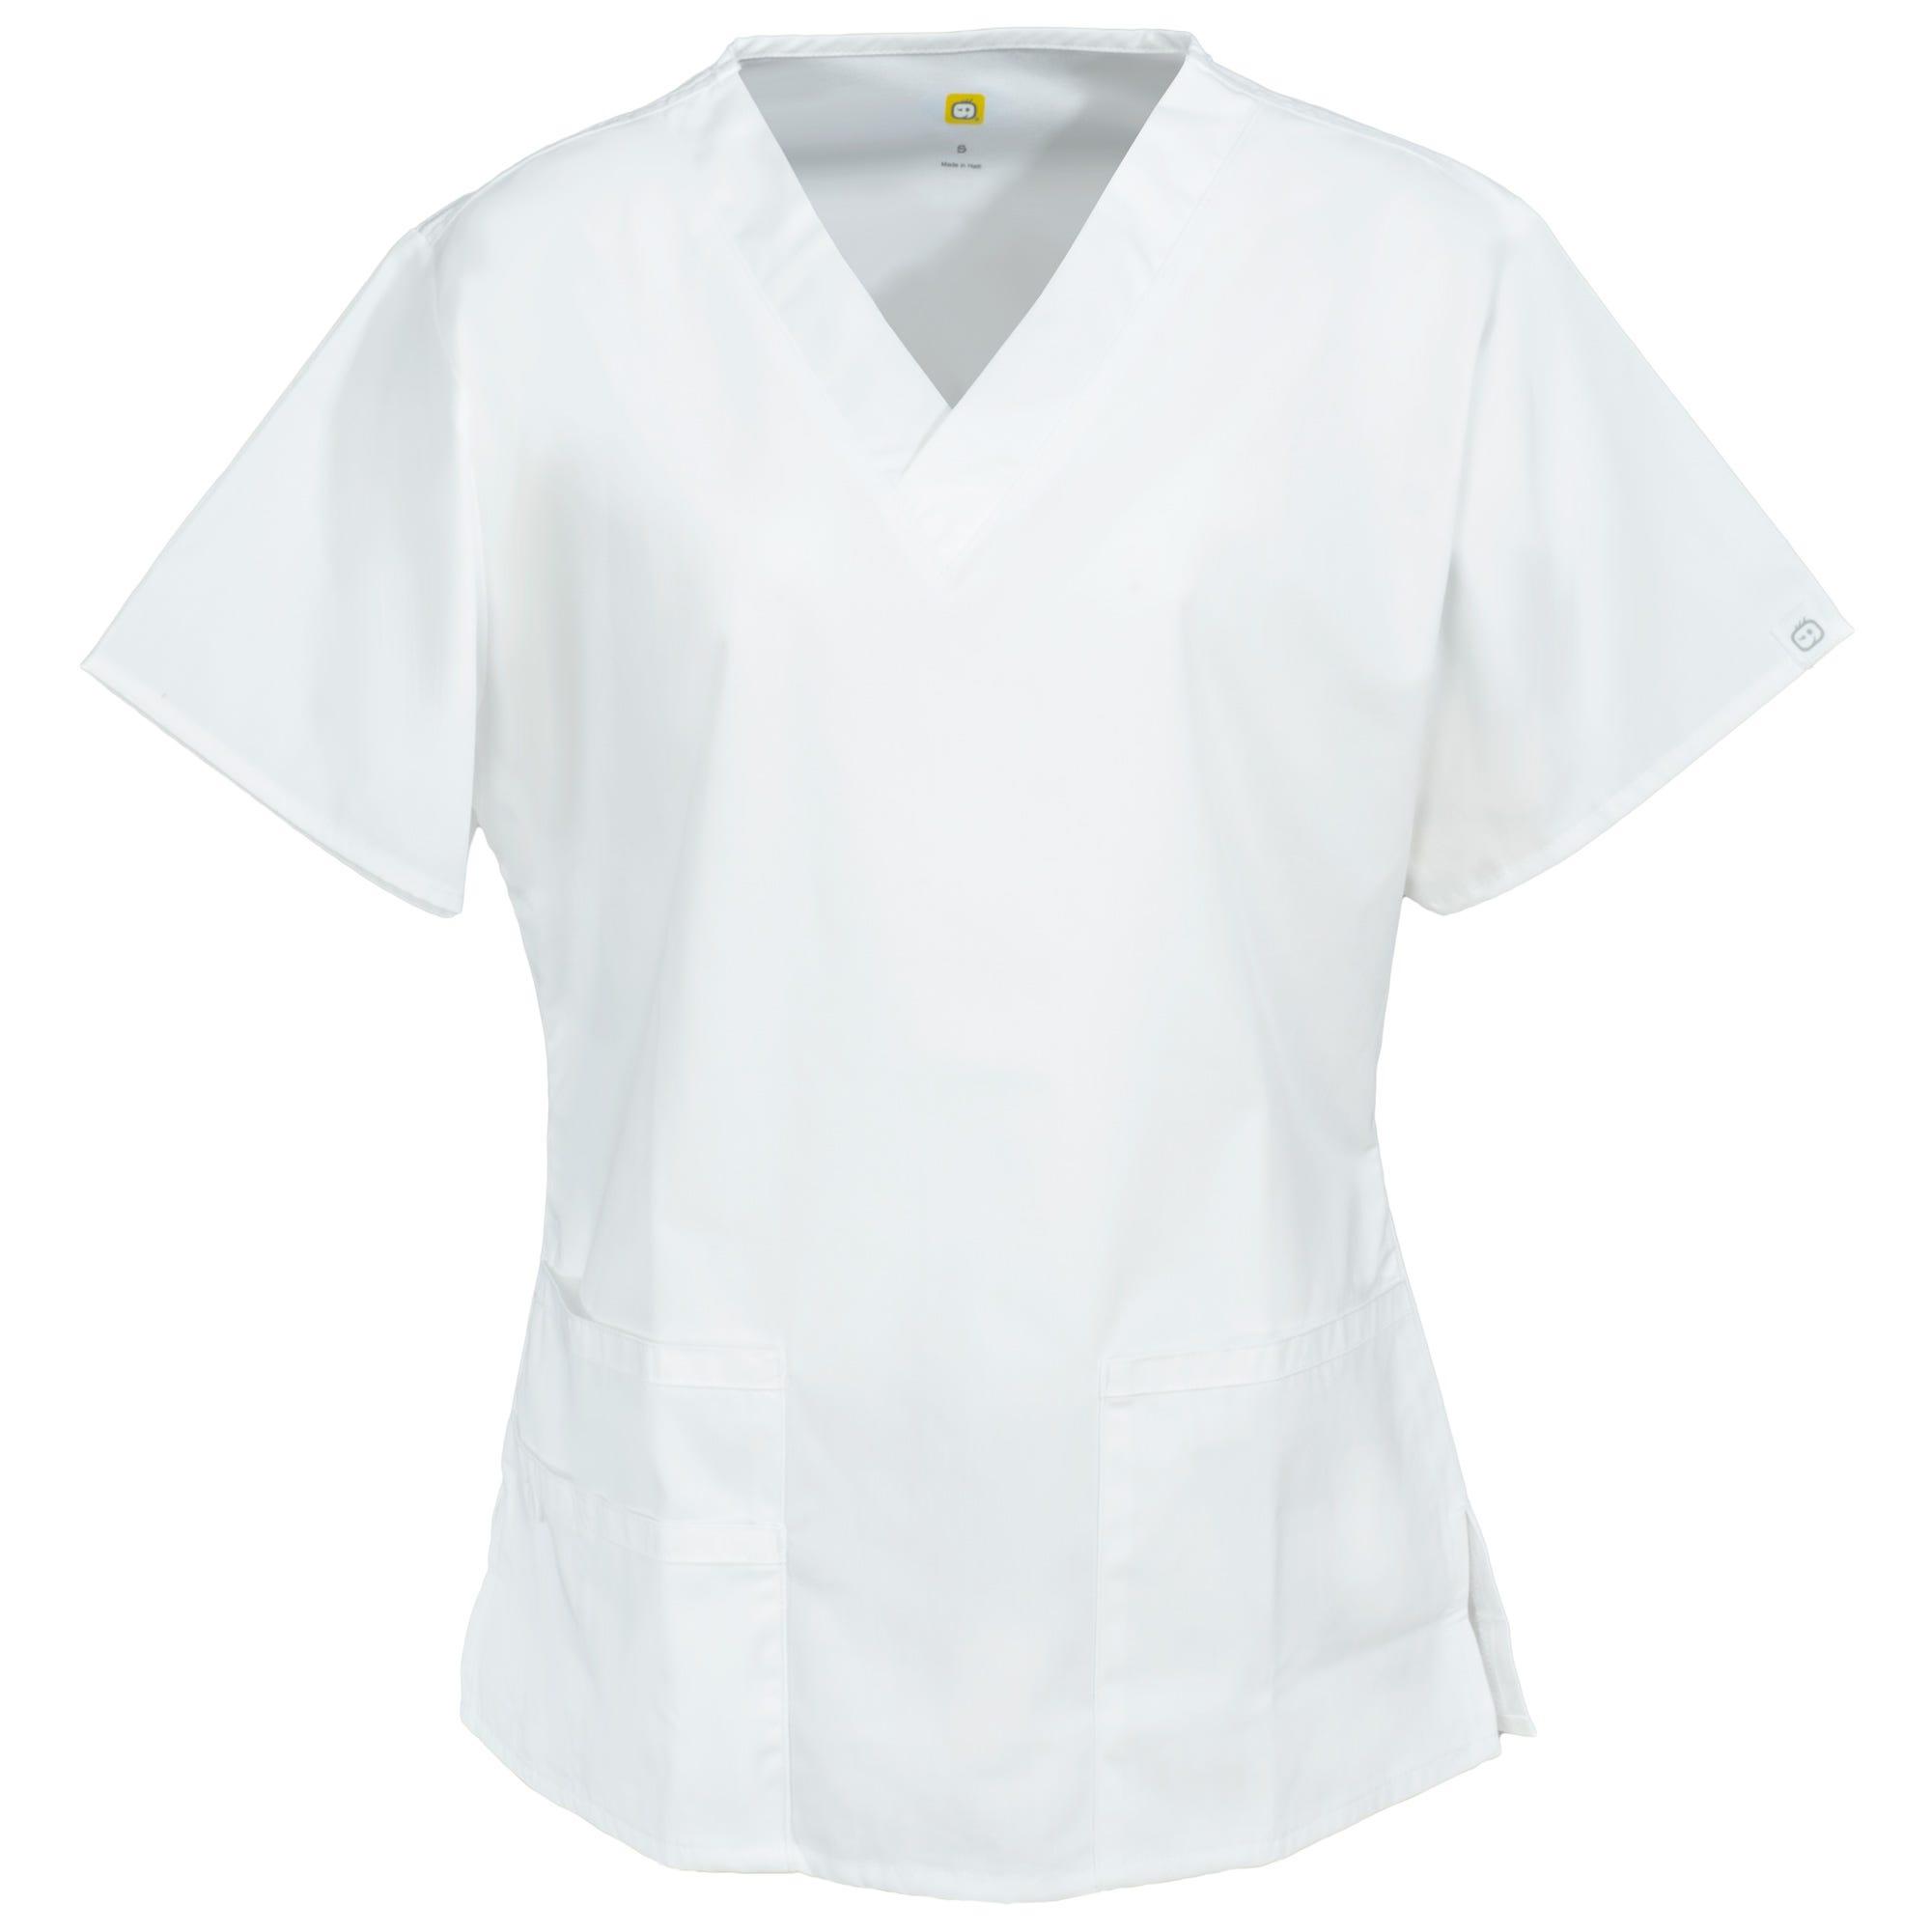 WonderWink Women's 6016 WHT White Bravo V-Neck Cotton/Poly Scrub Top